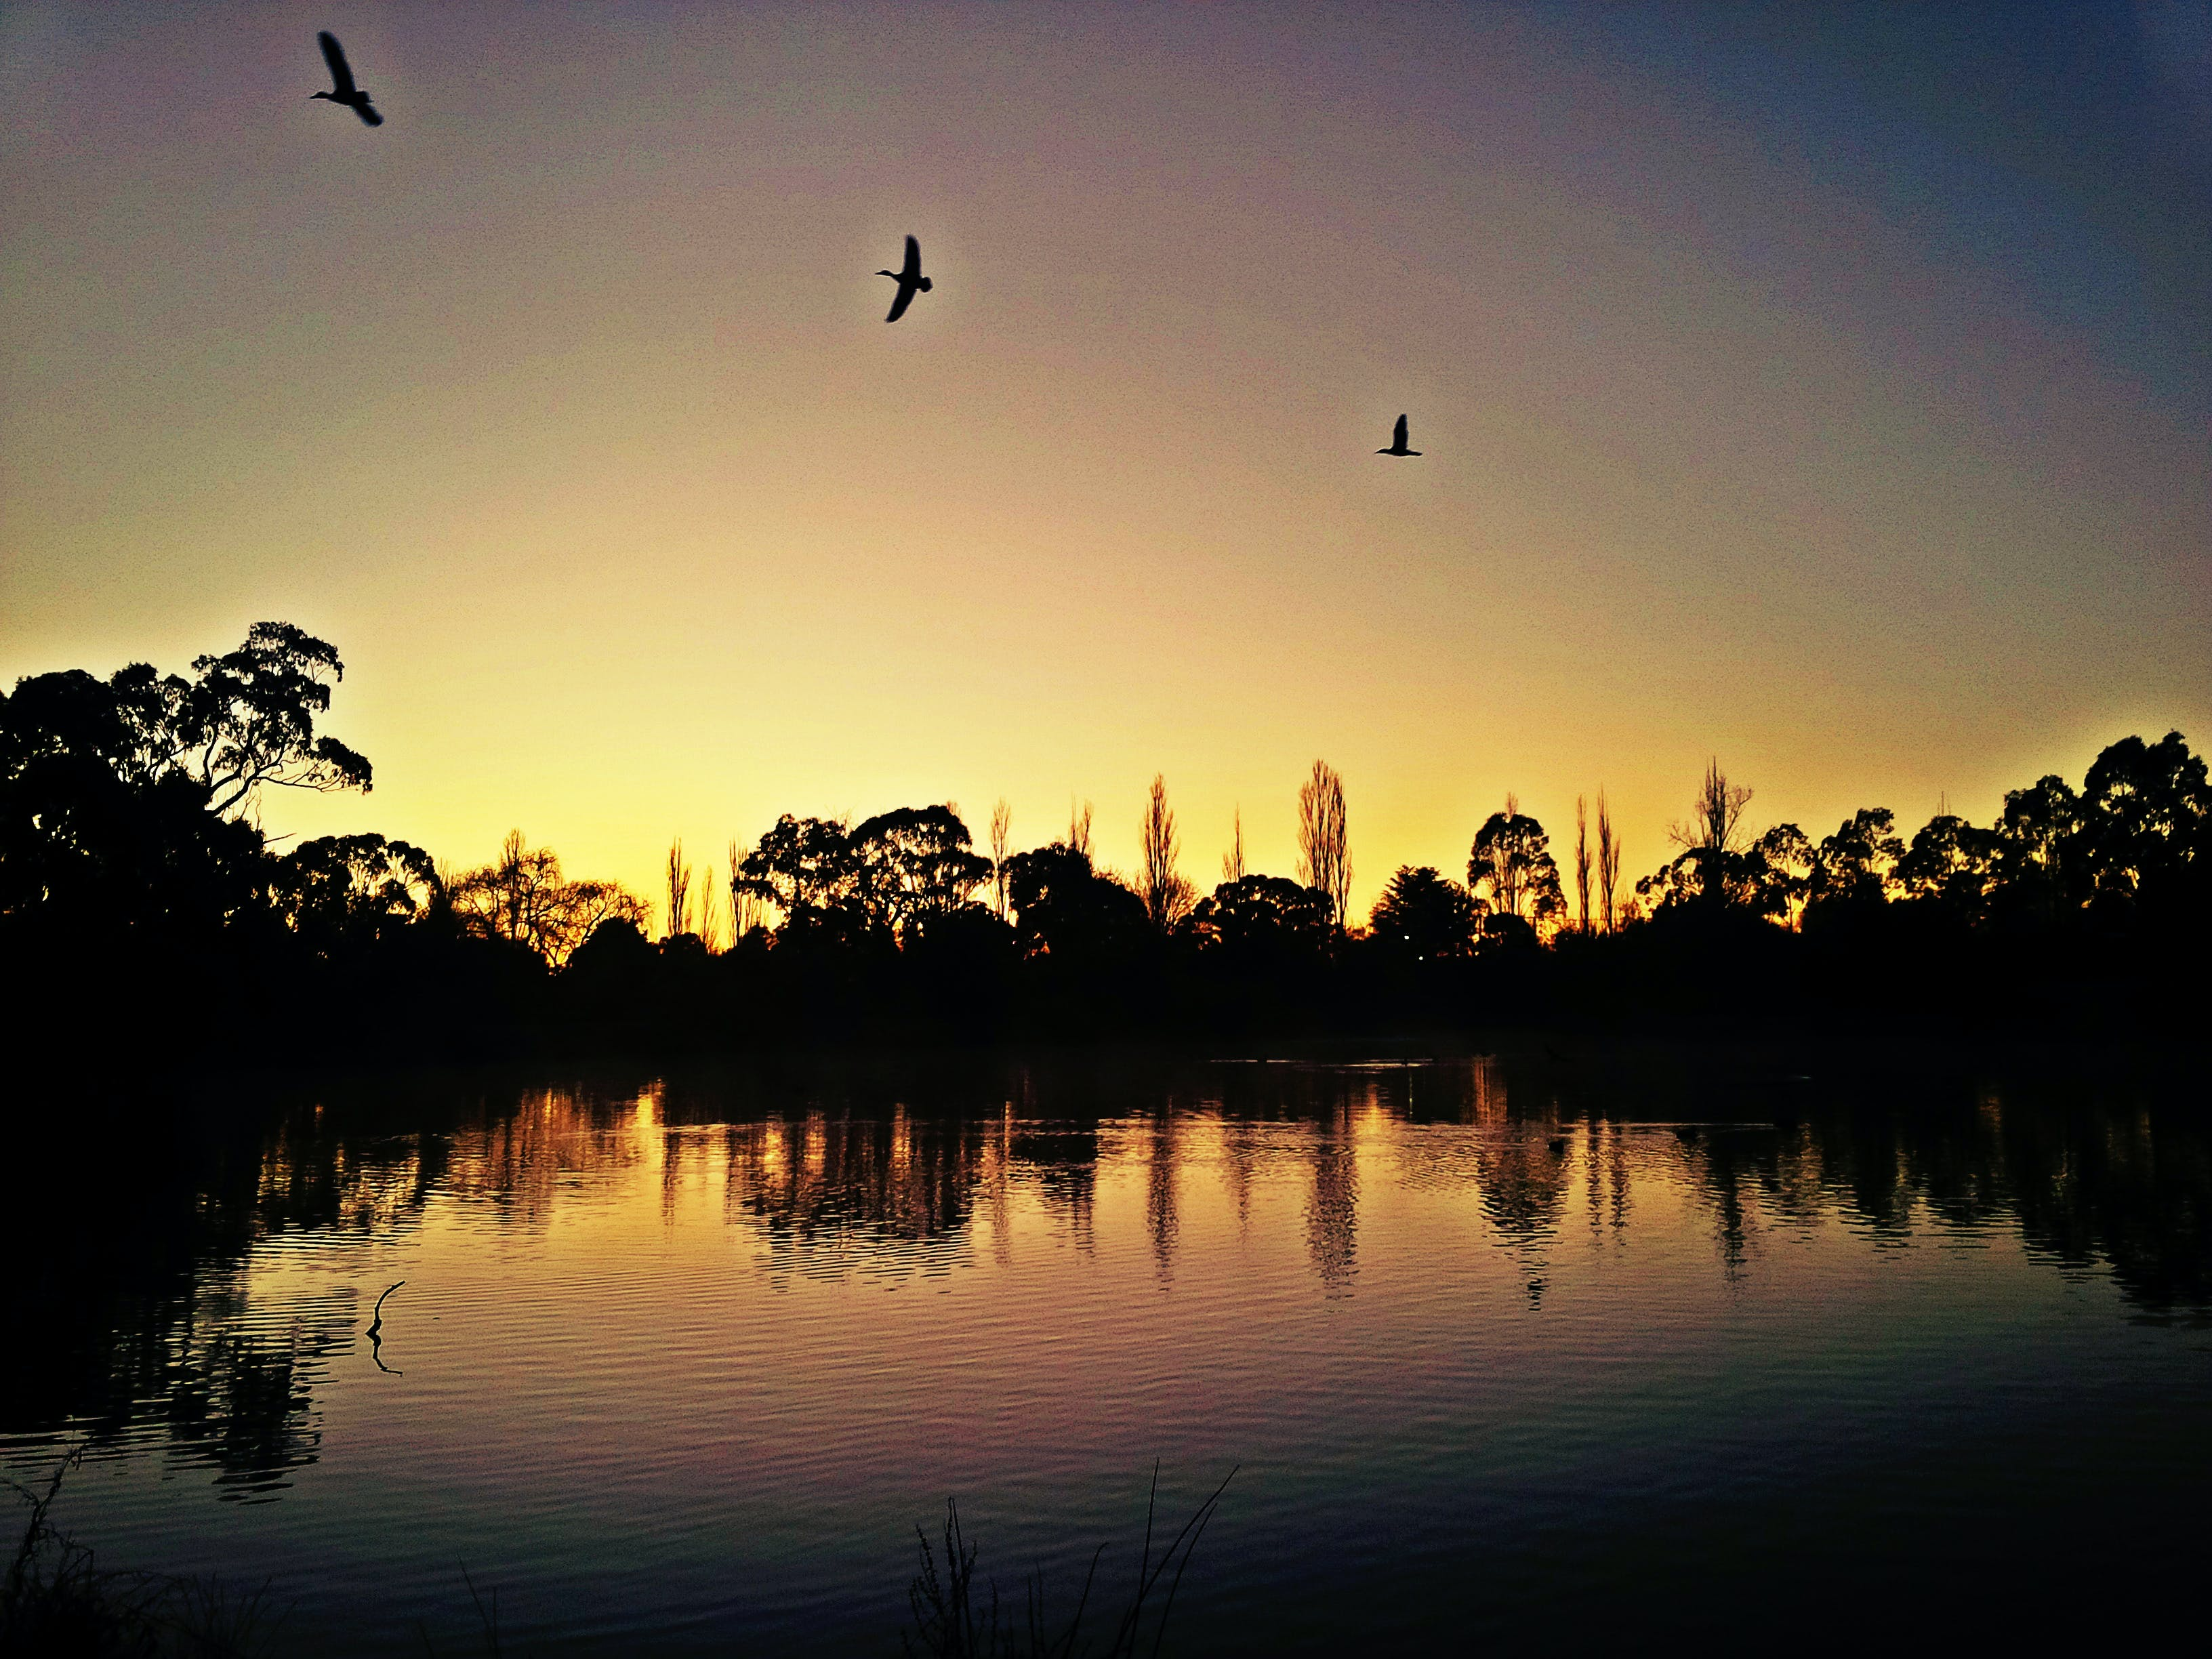 Free stock photo of ducks flying over dam in early morning light